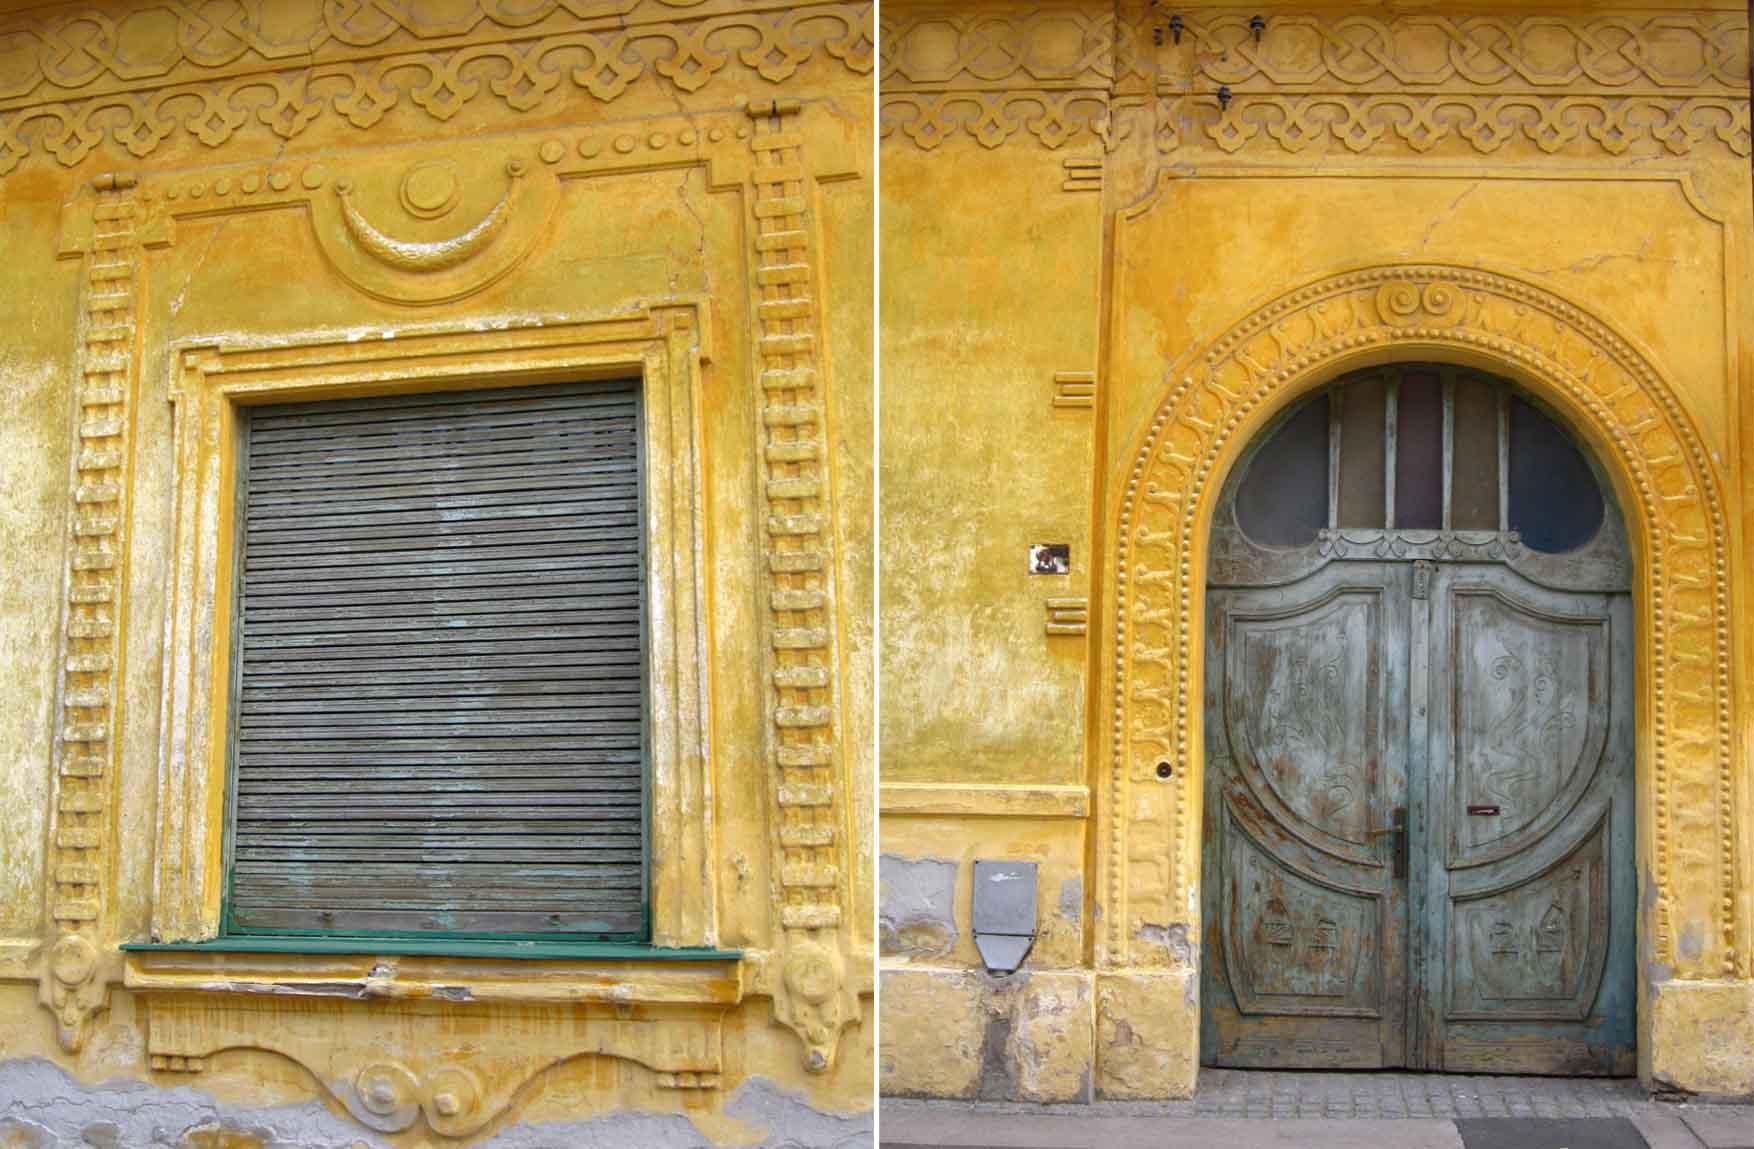 77 sombor vrata i prozor